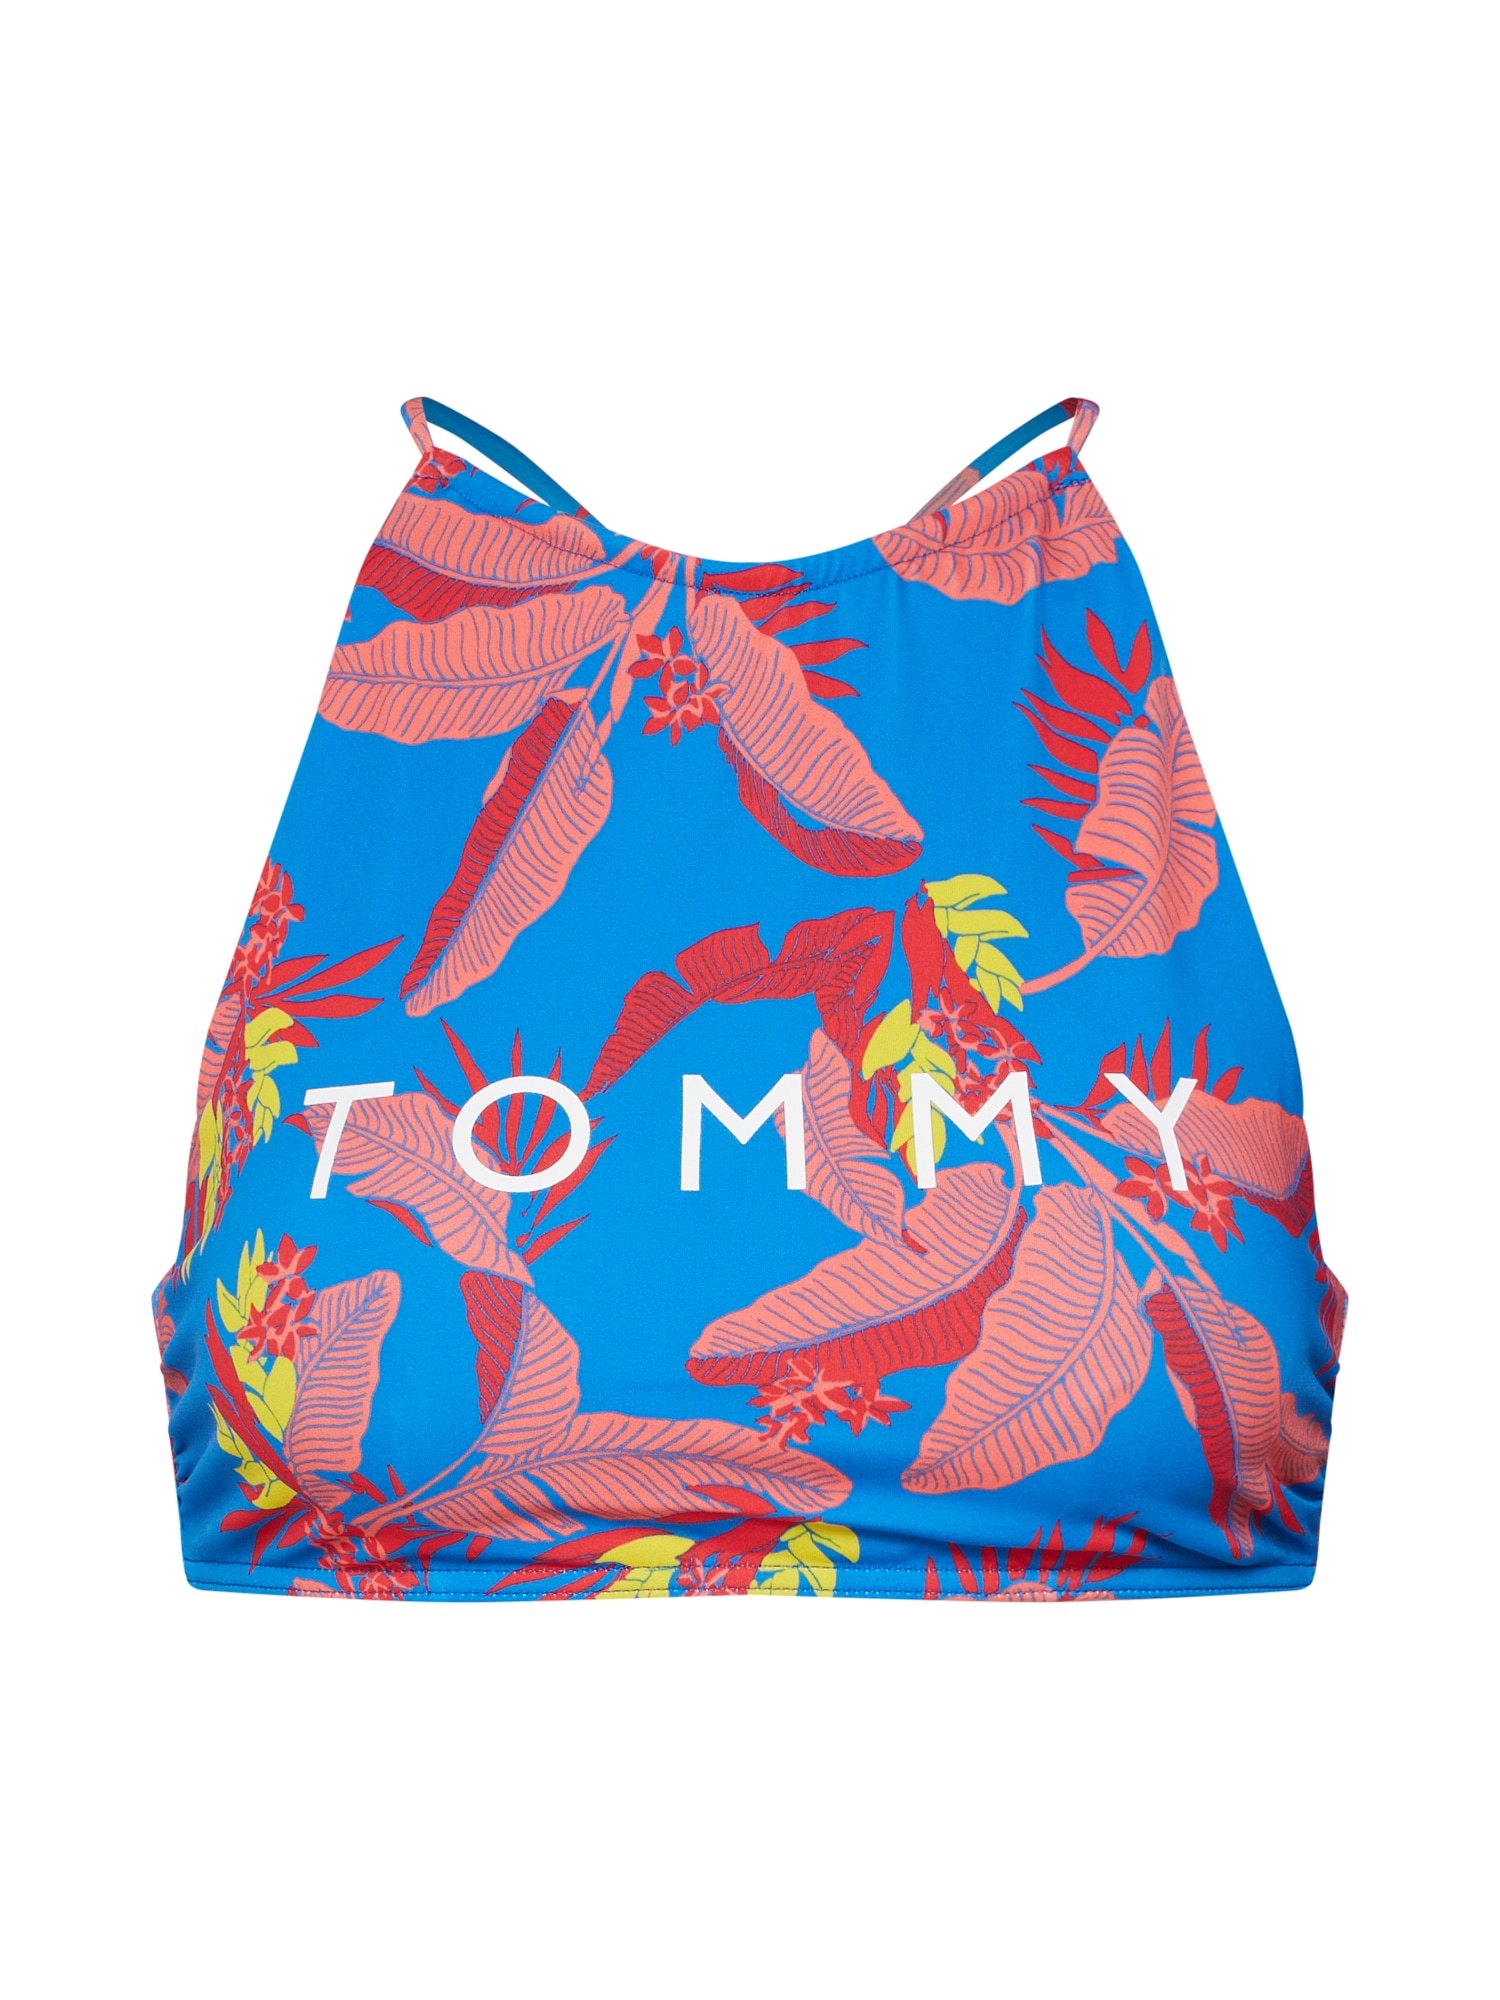 Horní díl plavek CROP TOP RP mix barev Tommy Hilfiger Underwear